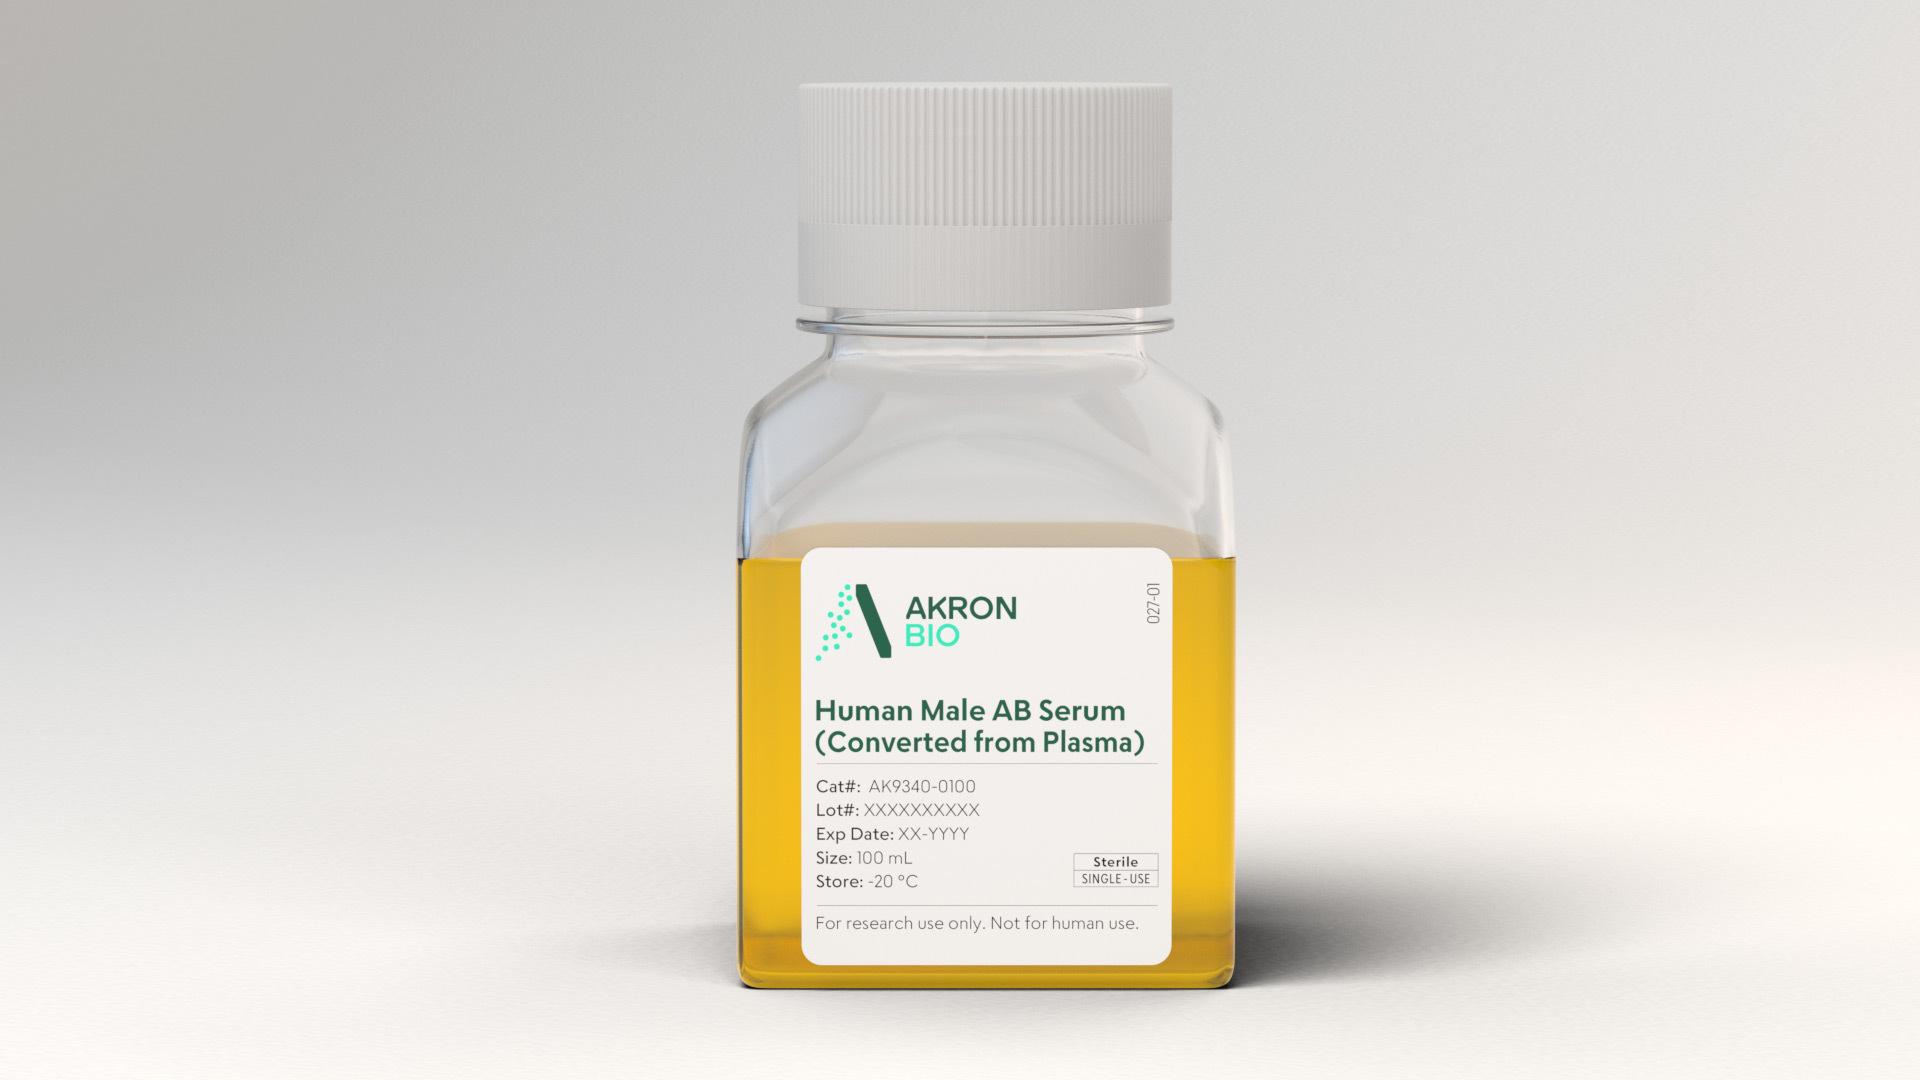 Human Male AB Serum Center